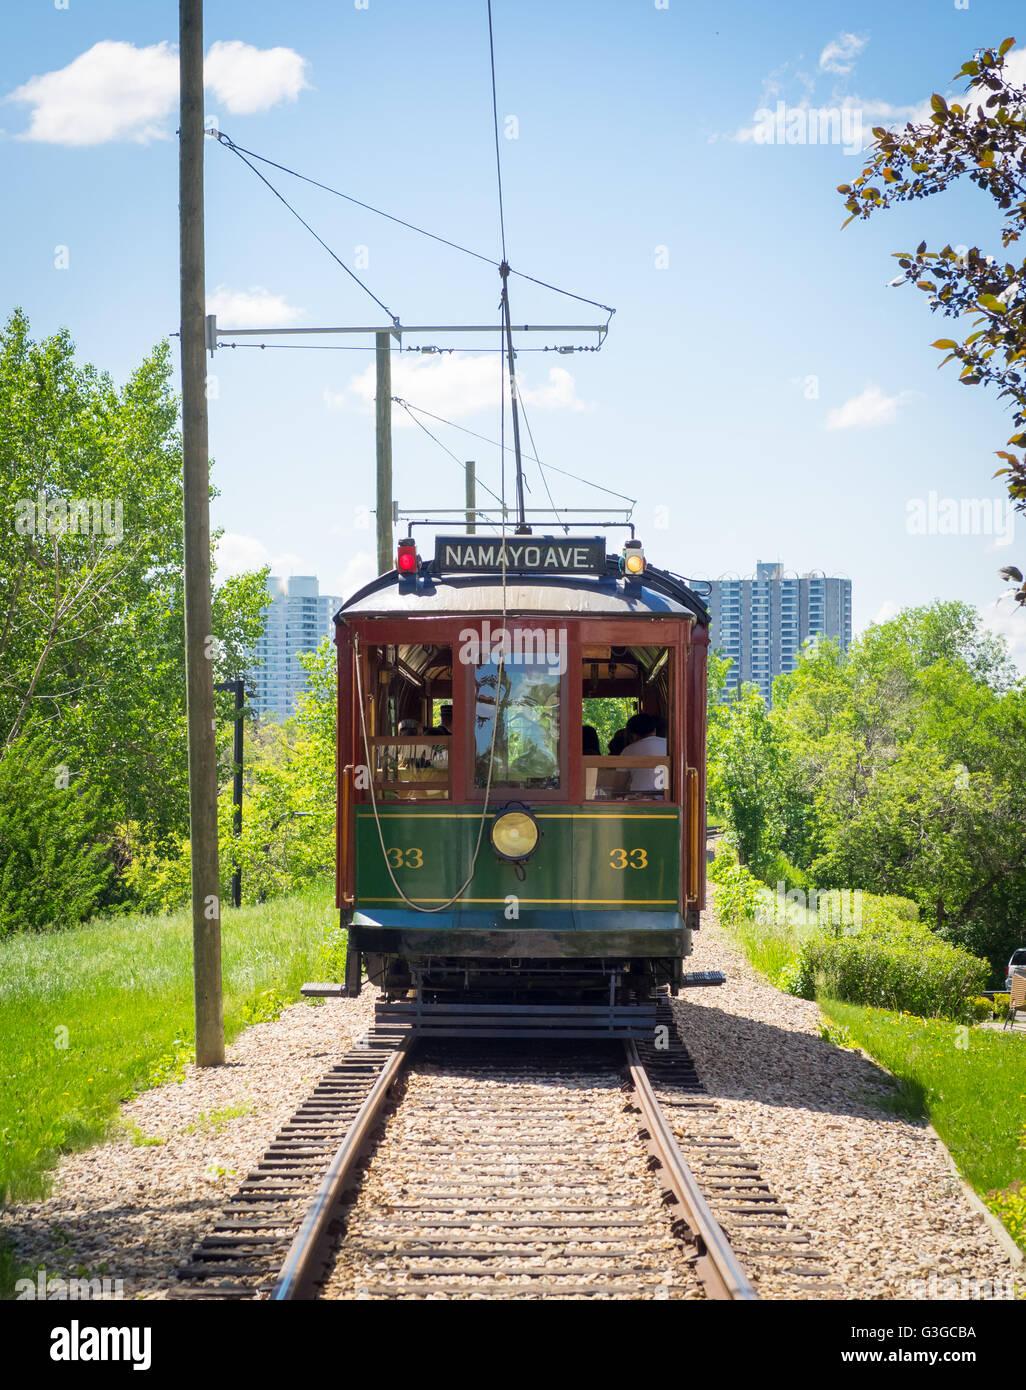 A view of the historic High Level Bridge Streetcar in Edmonton, Alberta, Canada.  (Edmonton Streetcar #33 shown). - Stock Image